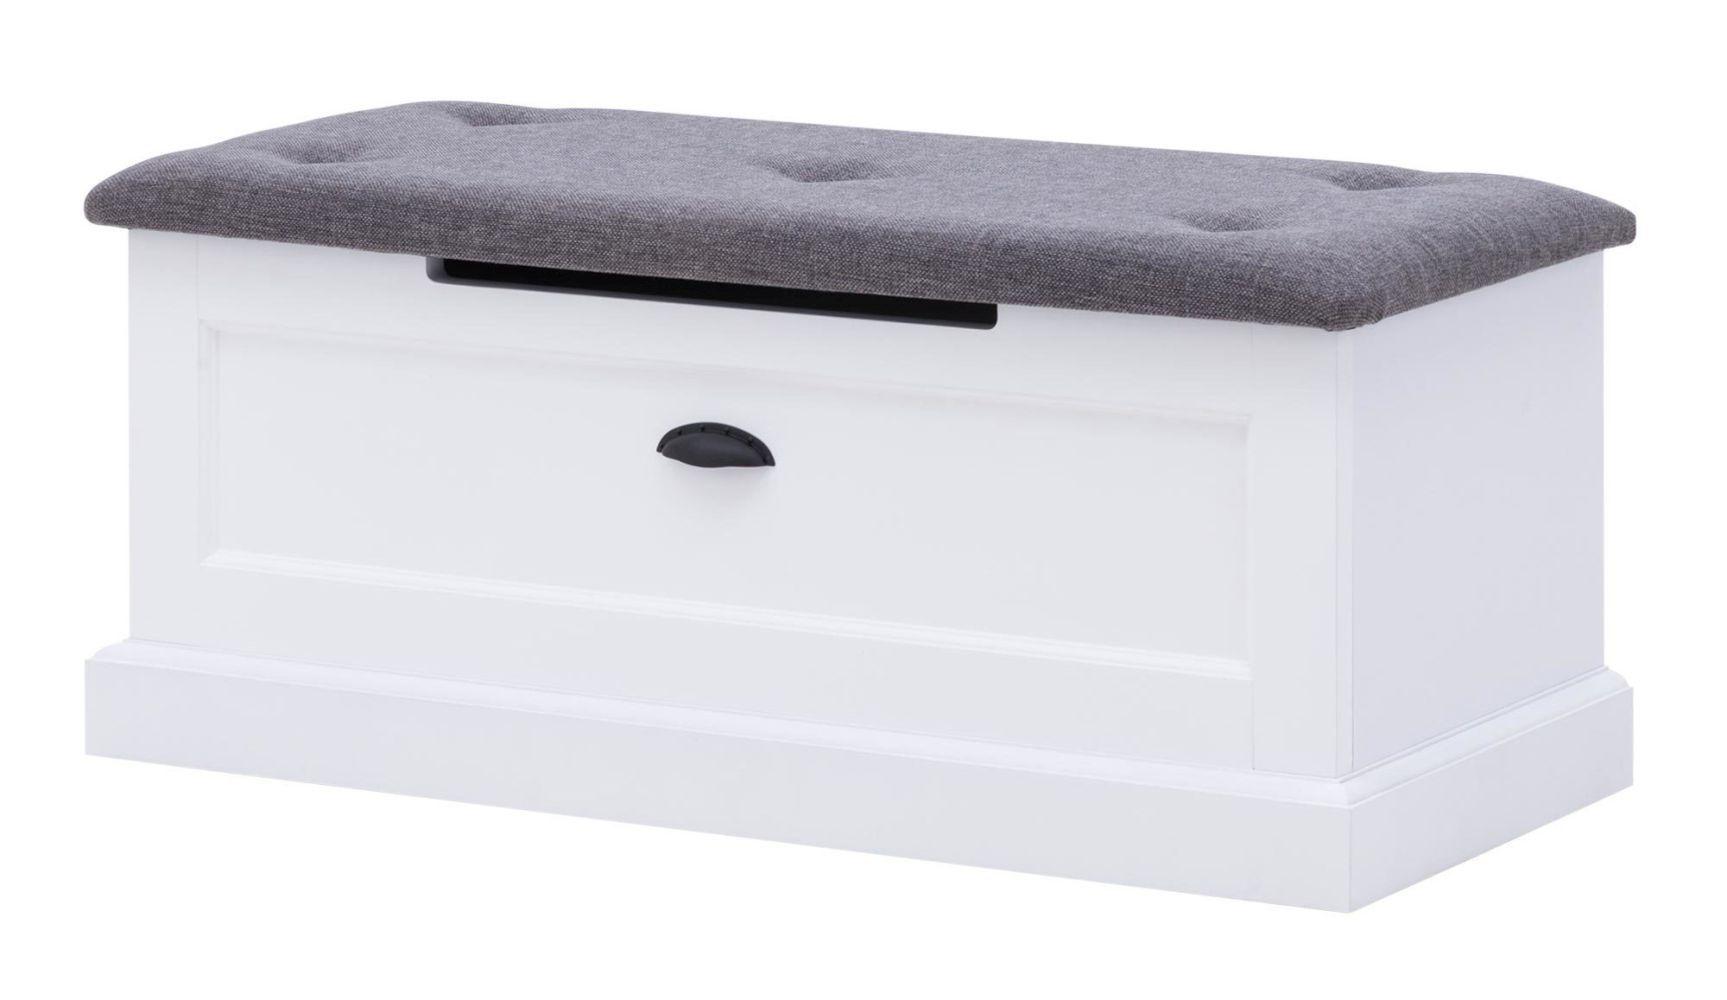 Truhe Rasina 31, Farbe: Weiß - Abmessungen: 40 x 100 x 42 cm (H x B x T)